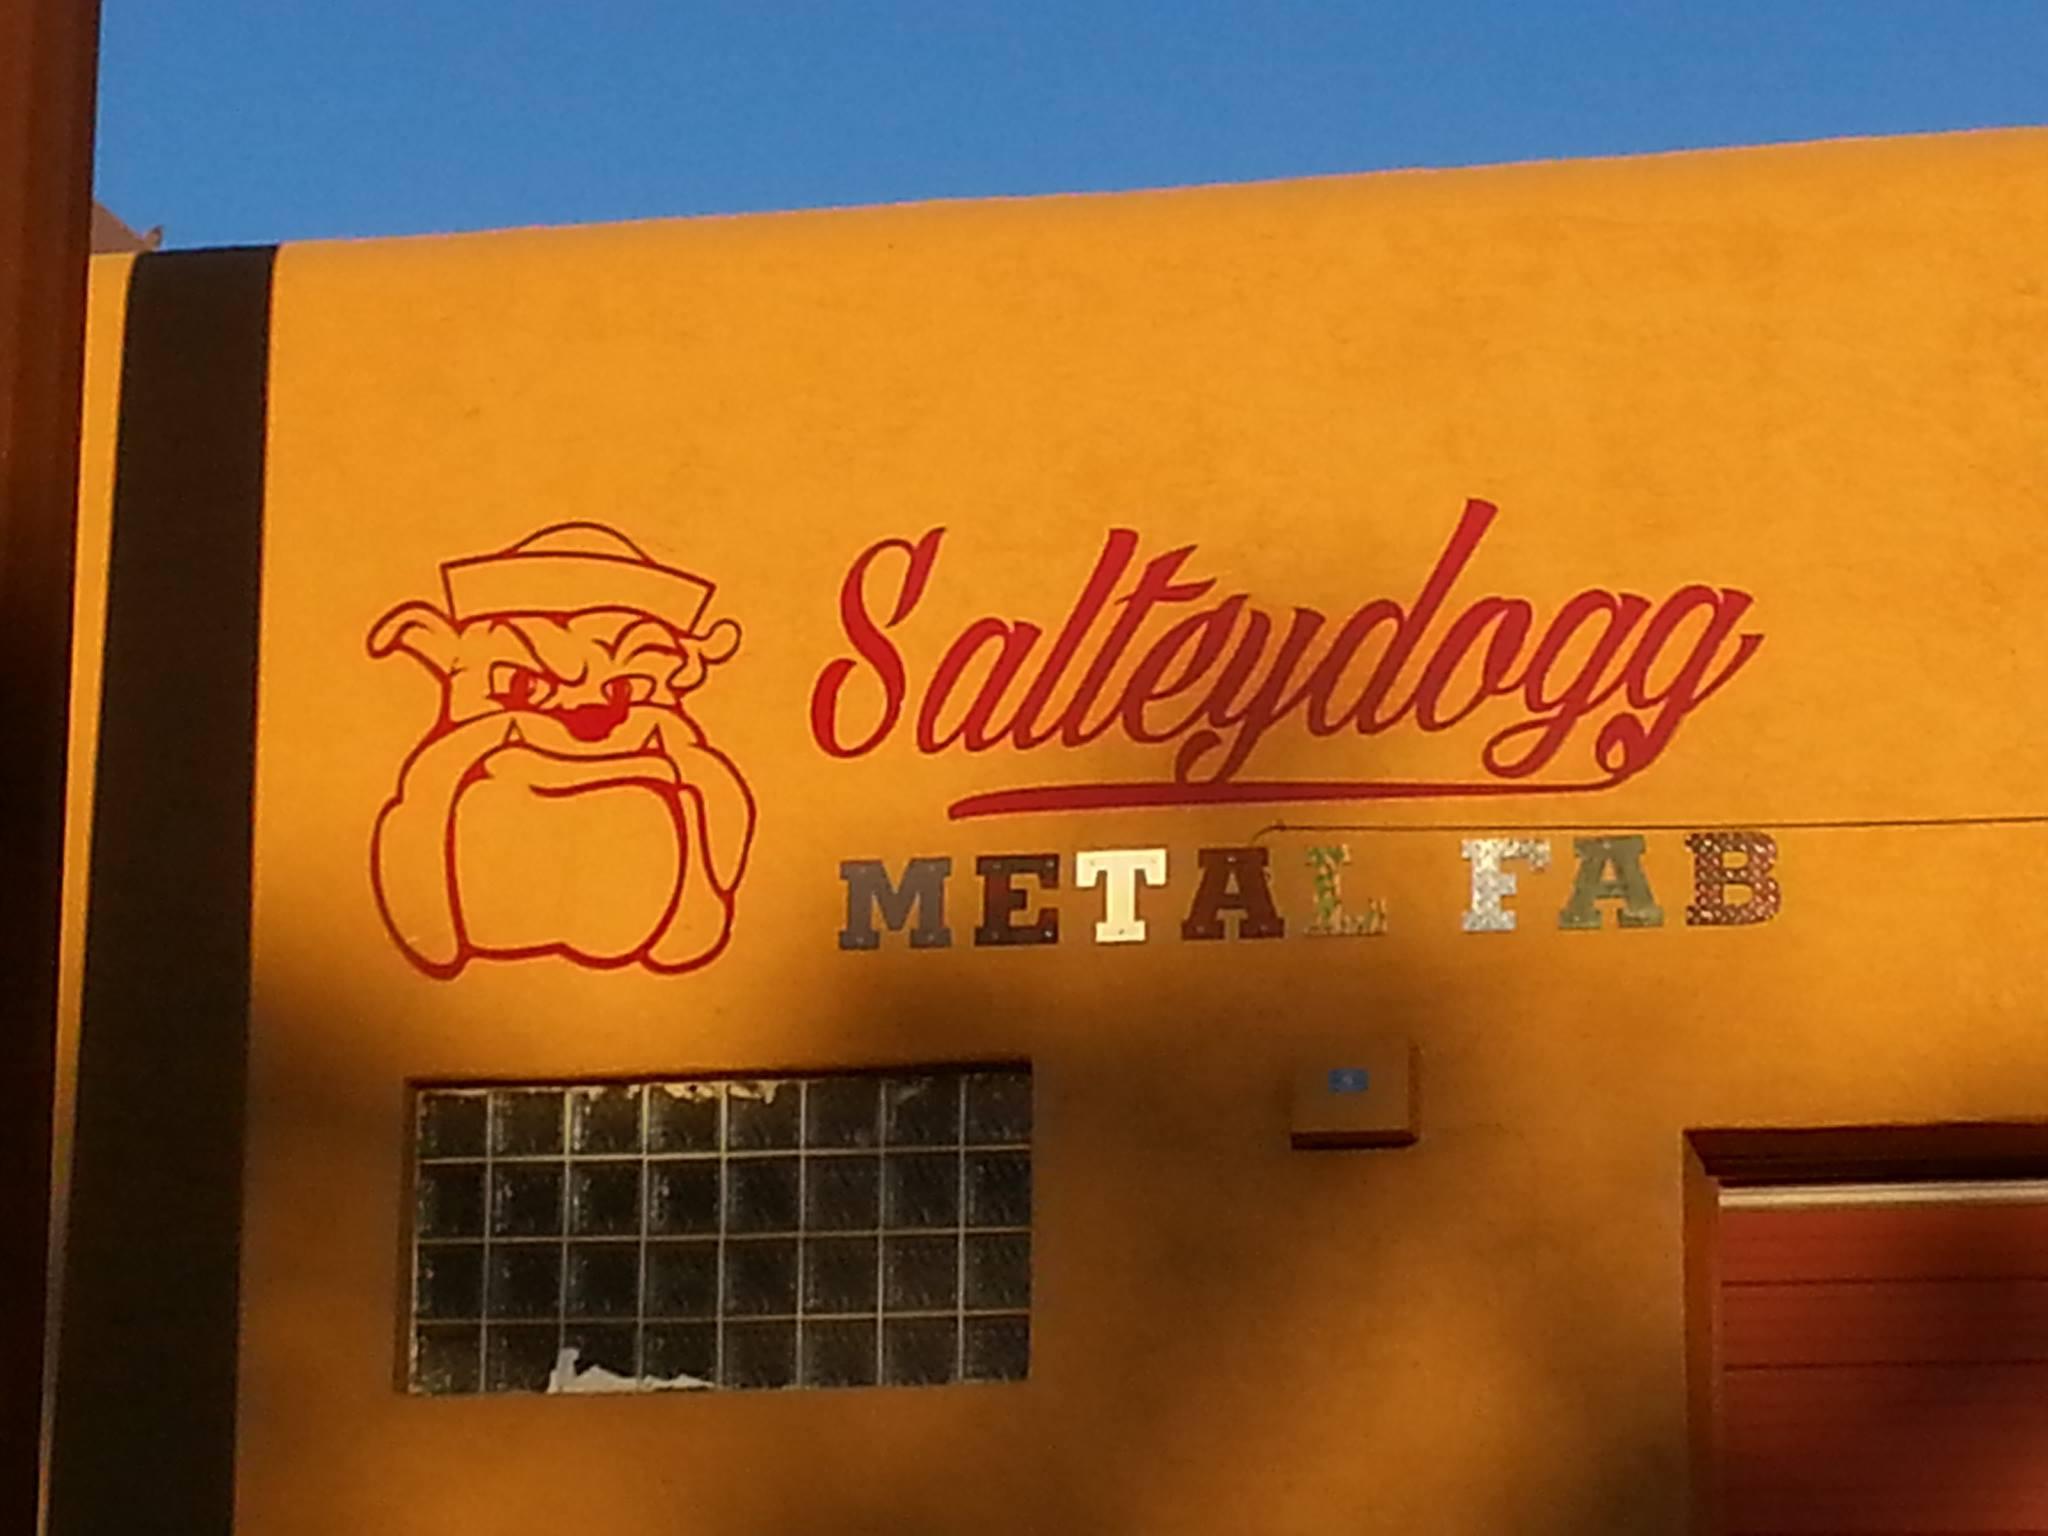 Salteydogg Metal Fab Albuquerque Metal Fabrication.jpg